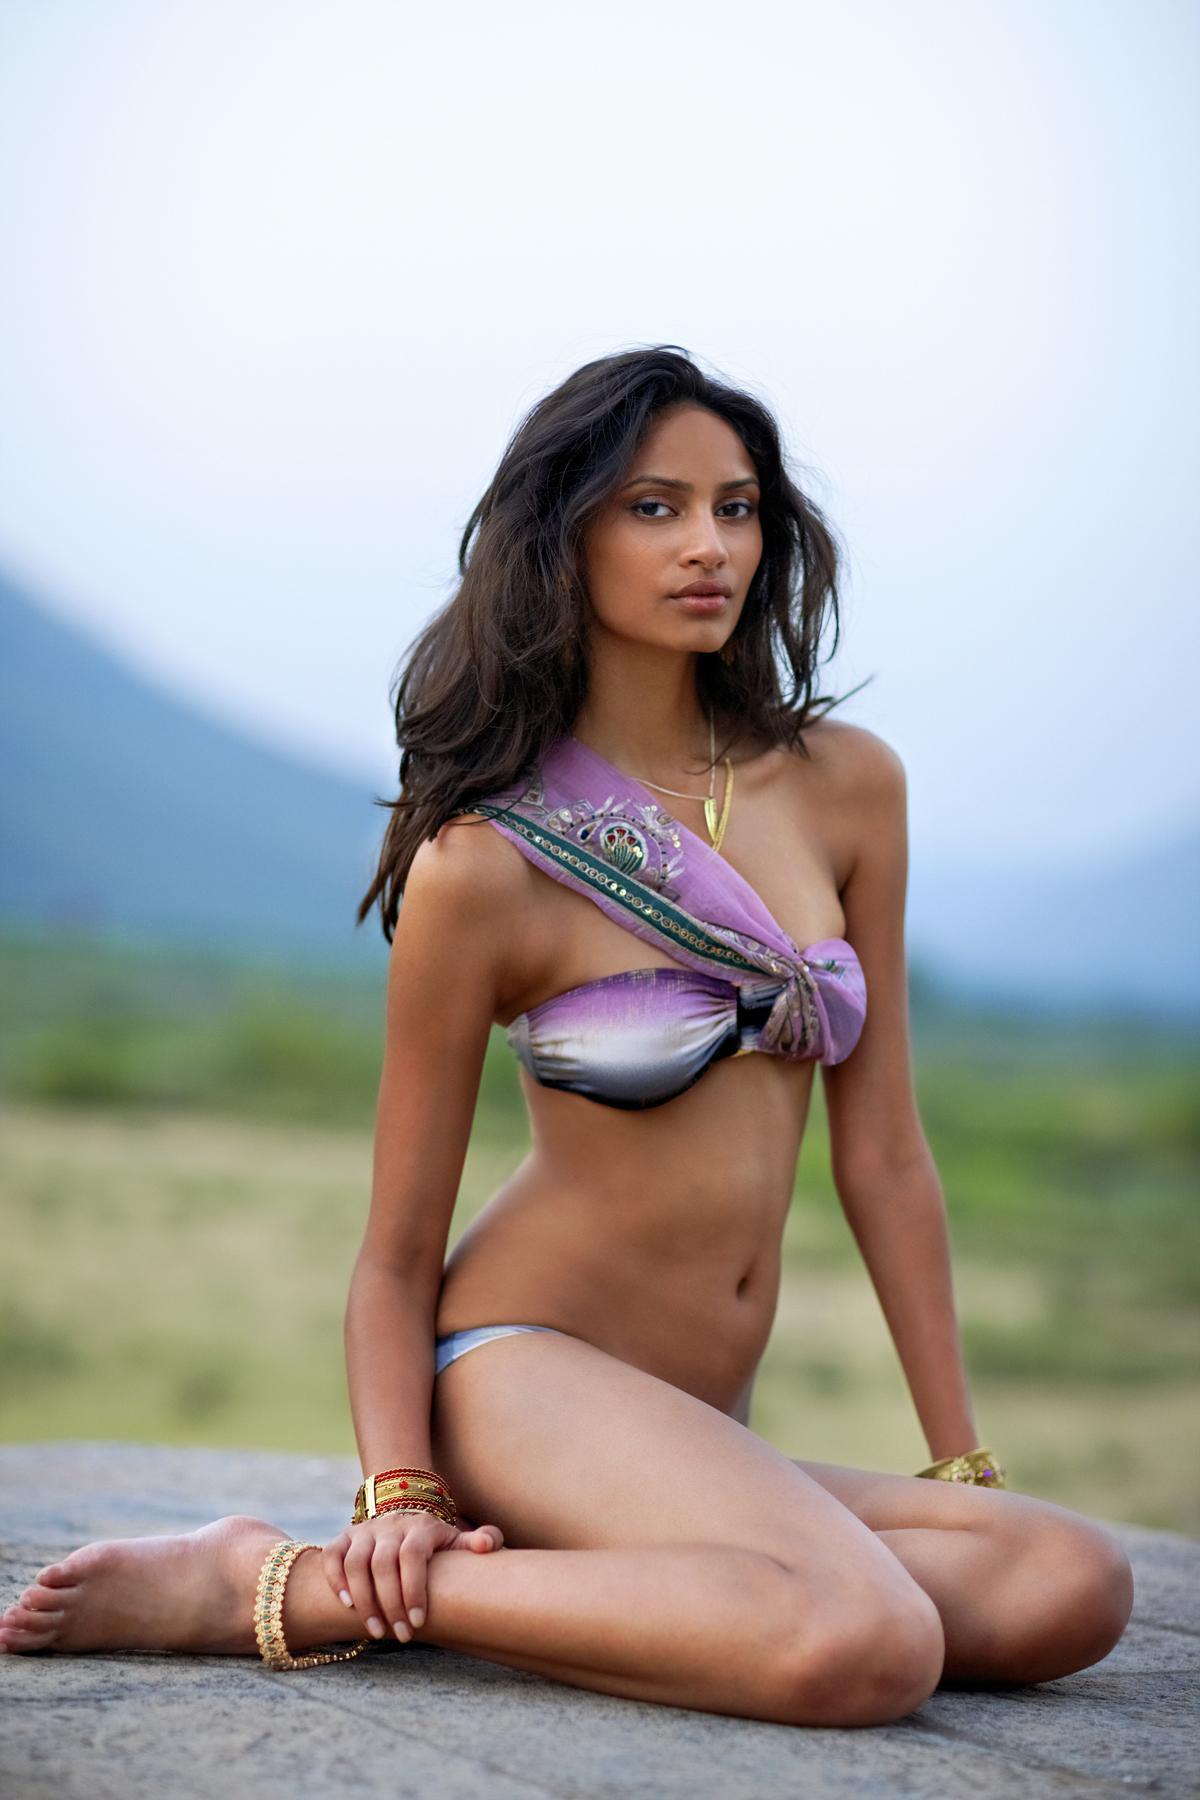 Фото моделей бикини даре 5 фотография